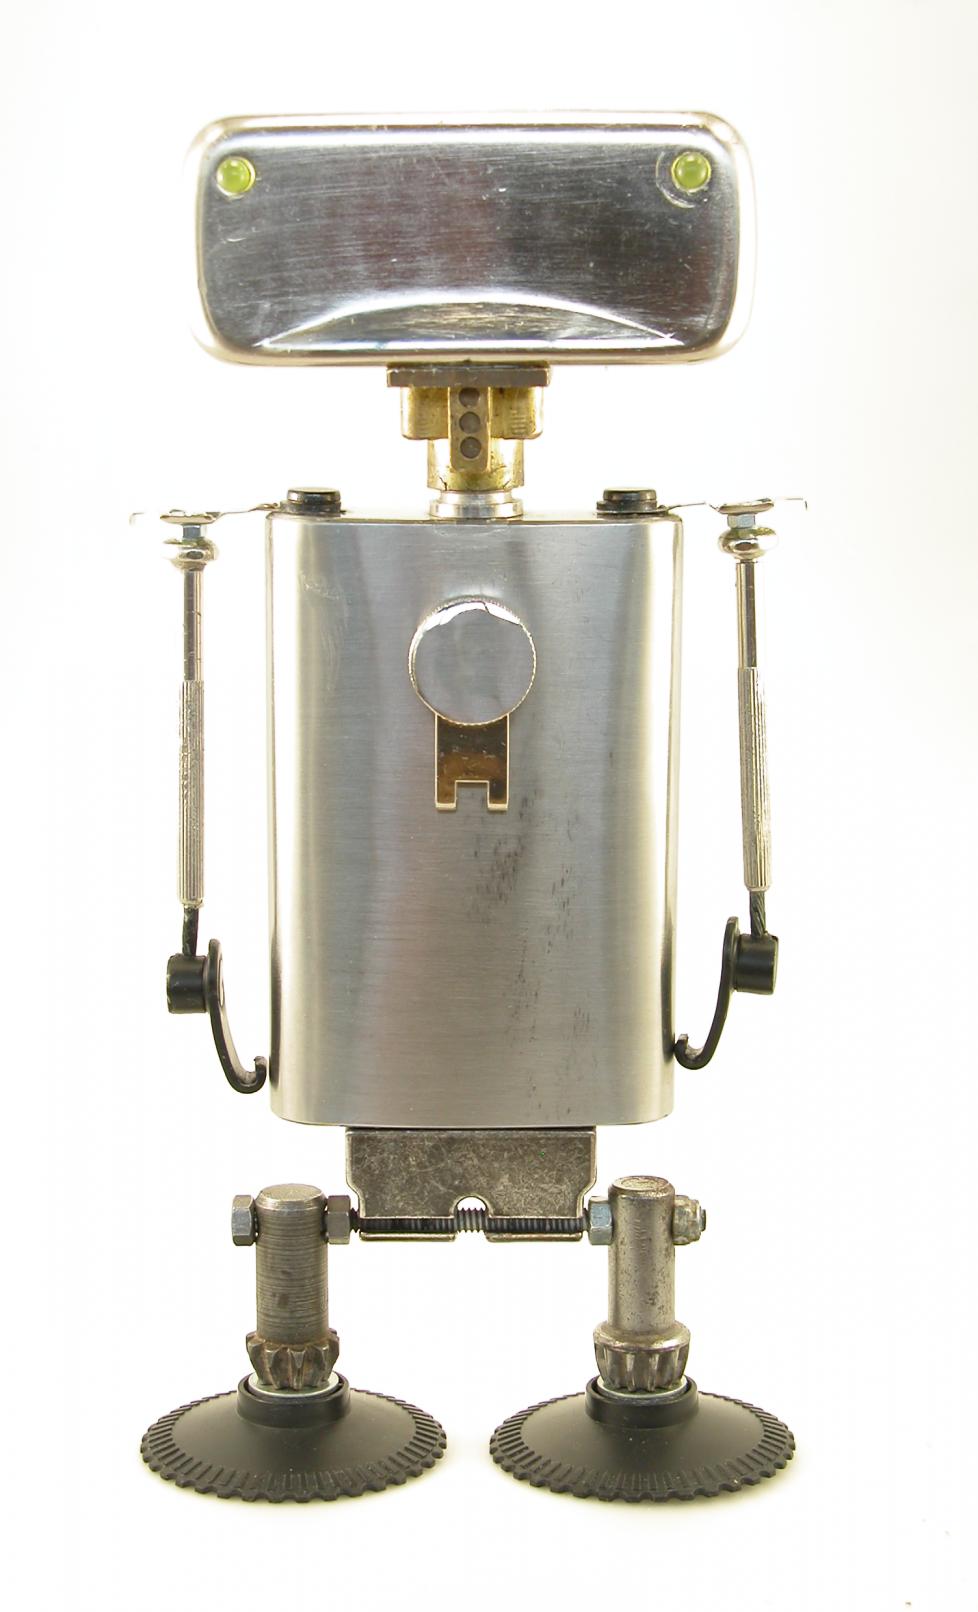 Escultura Drap Art - Robot de Reciclaje alfa 007 (2019) - Alfredo Blasco Nuin - Alfacto